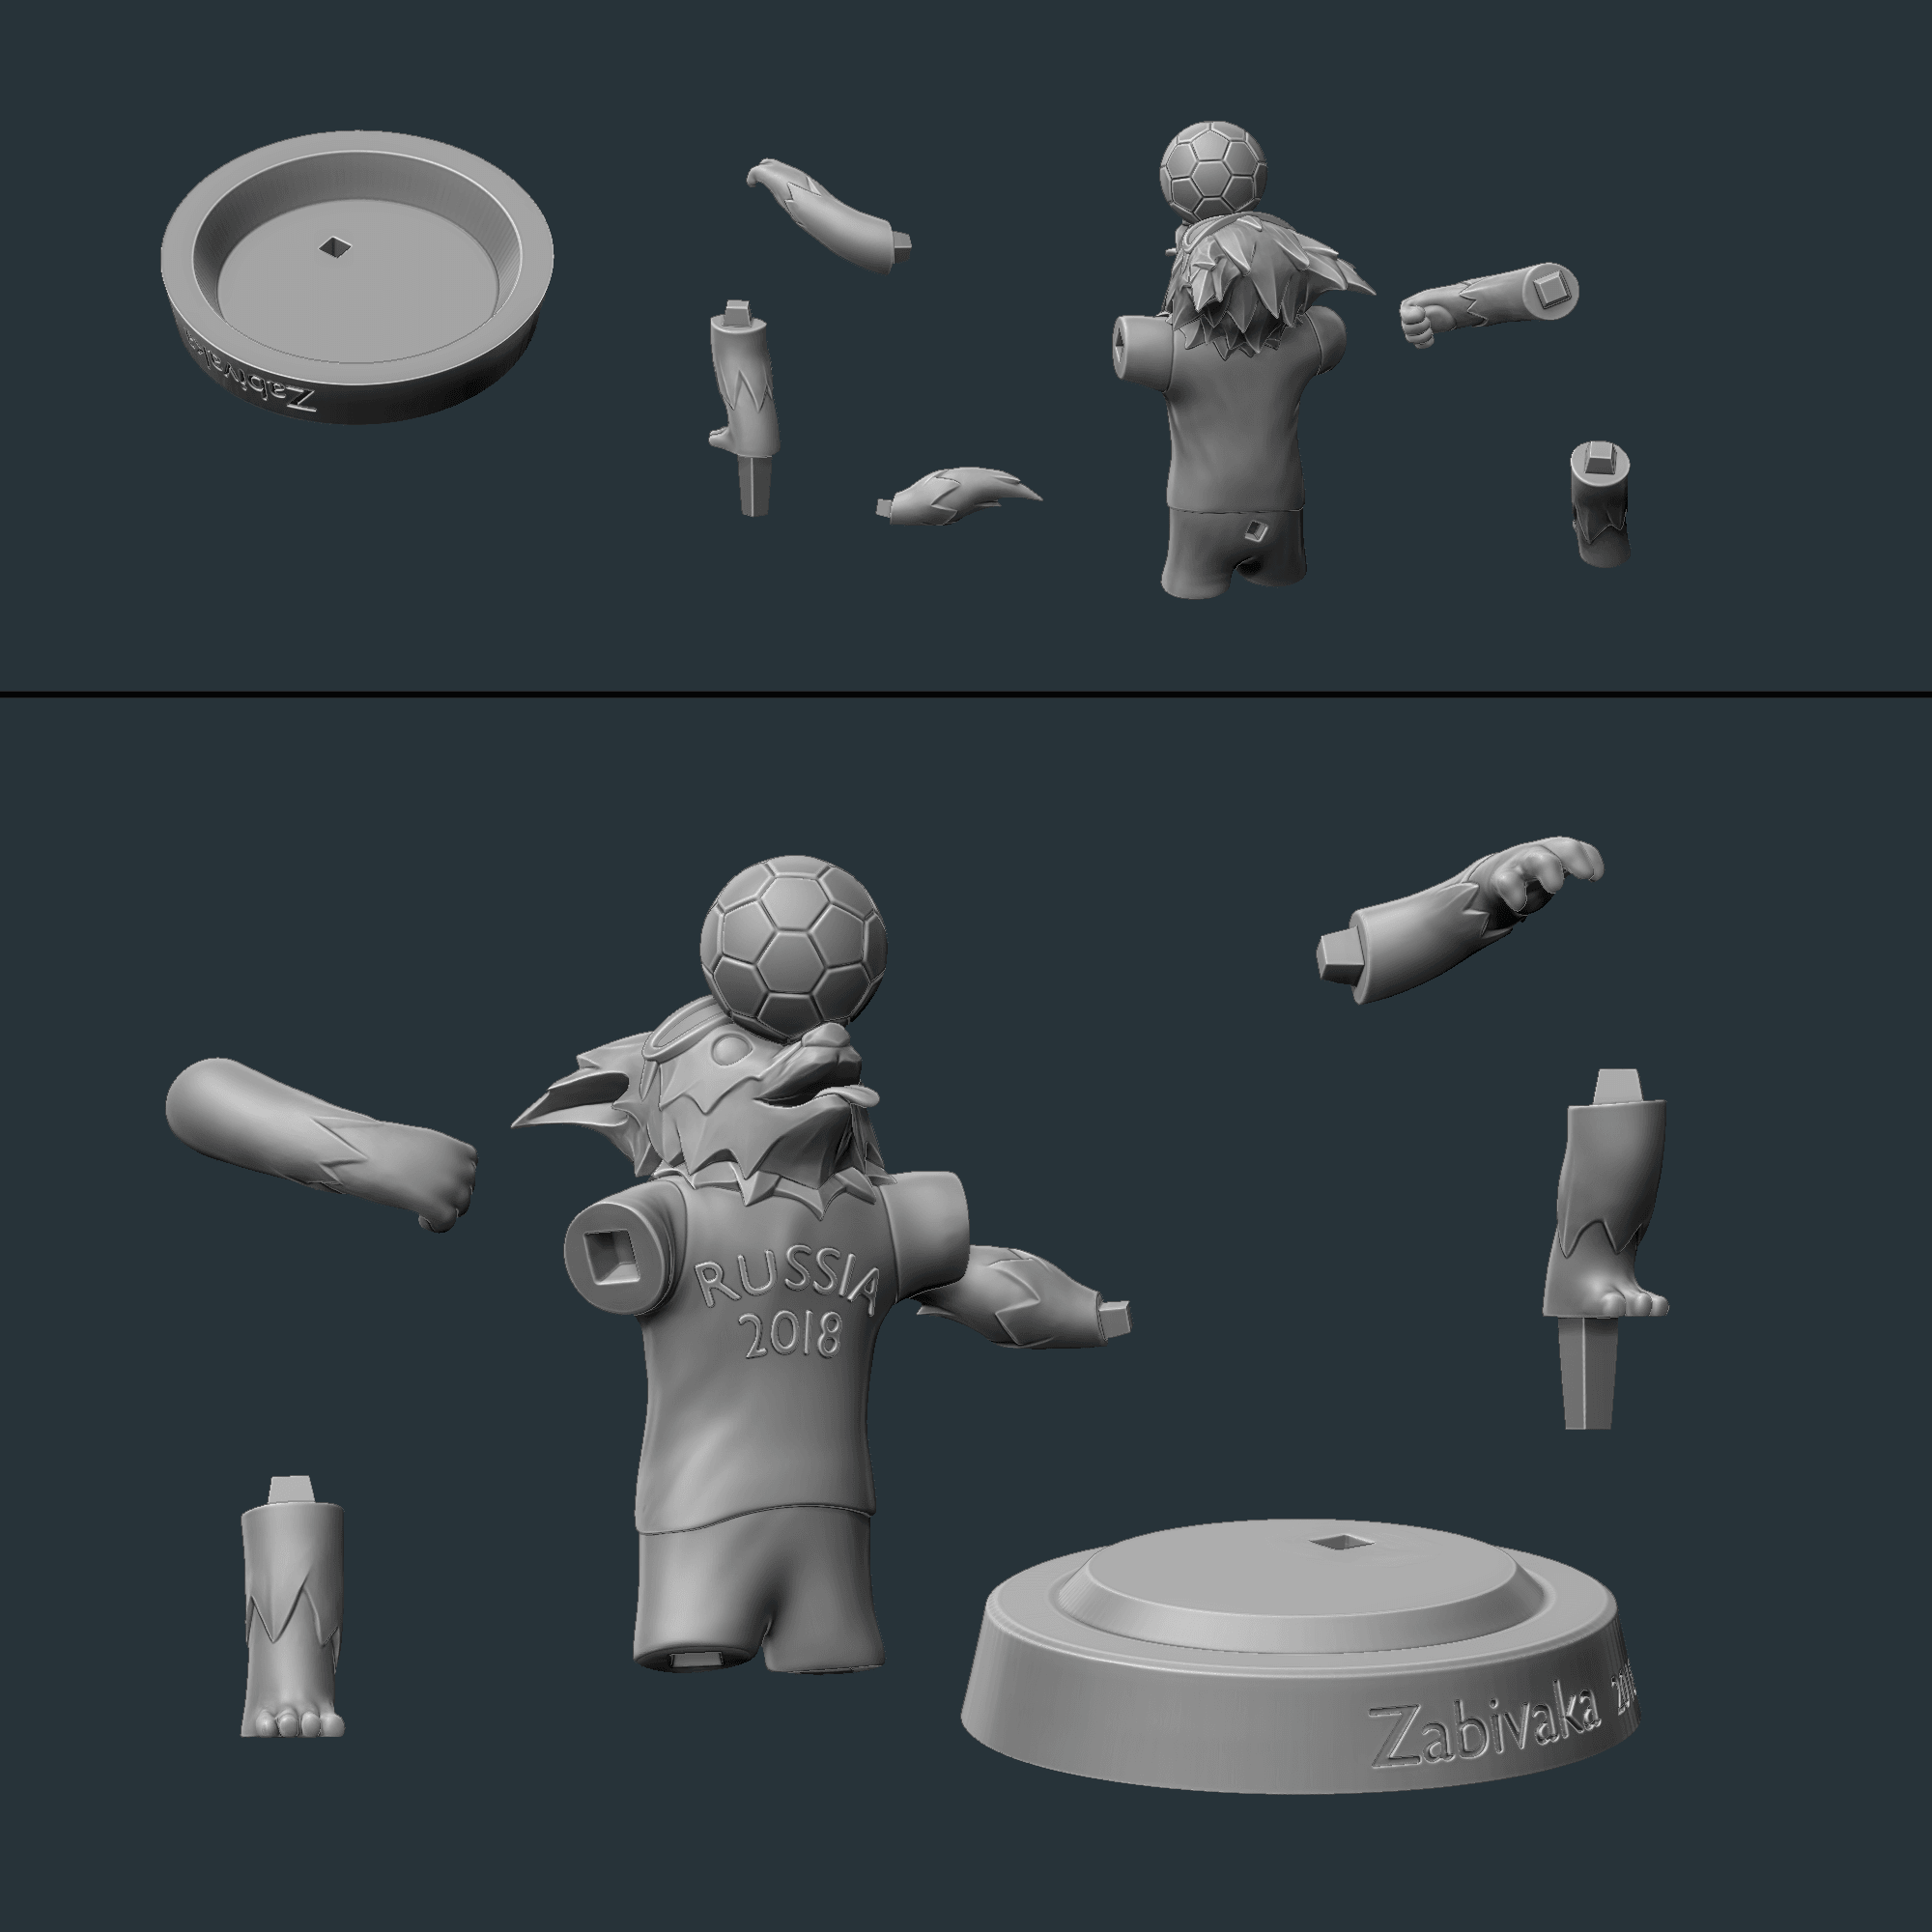 5.png Download OBJ file Zabivaka World Cup 2018 Mascot • 3D printer template, NoEvil116